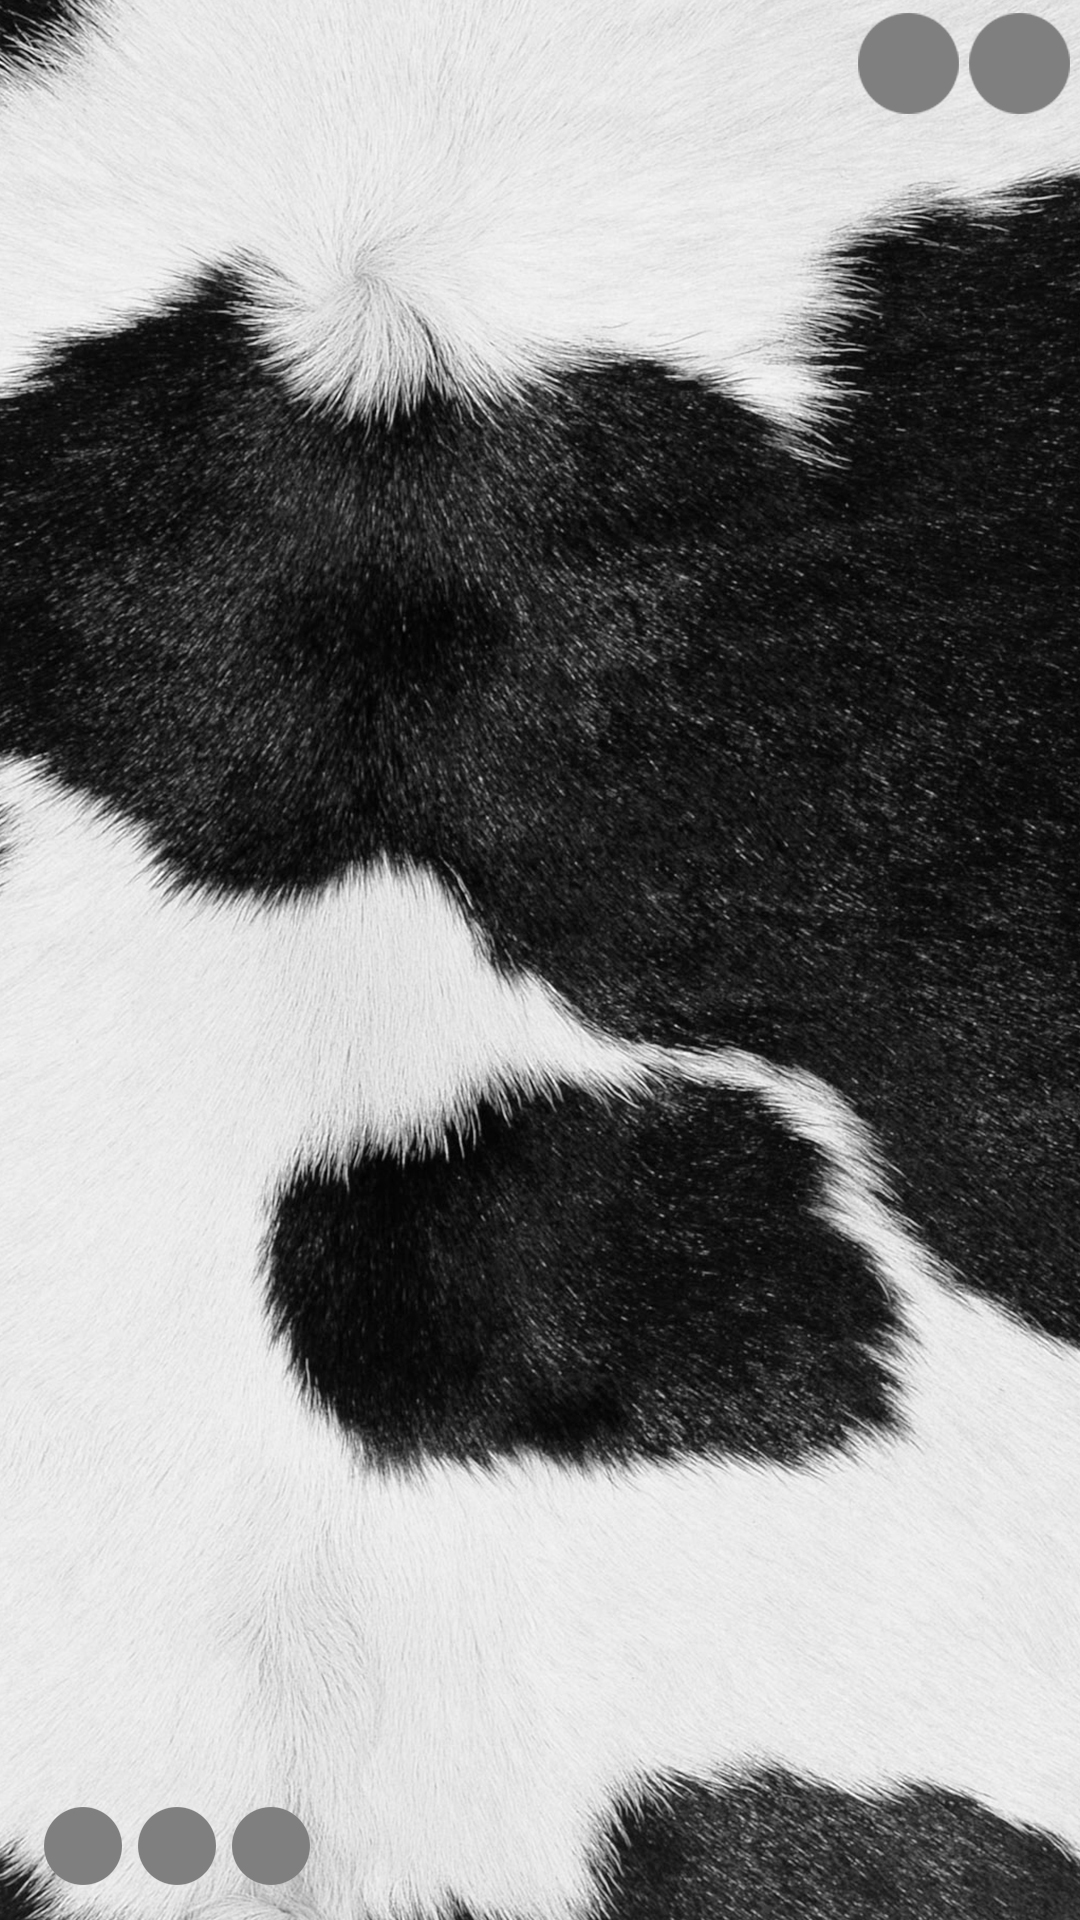 Fur Round Black And White Gray Wallpaper Sc Iphone6splus